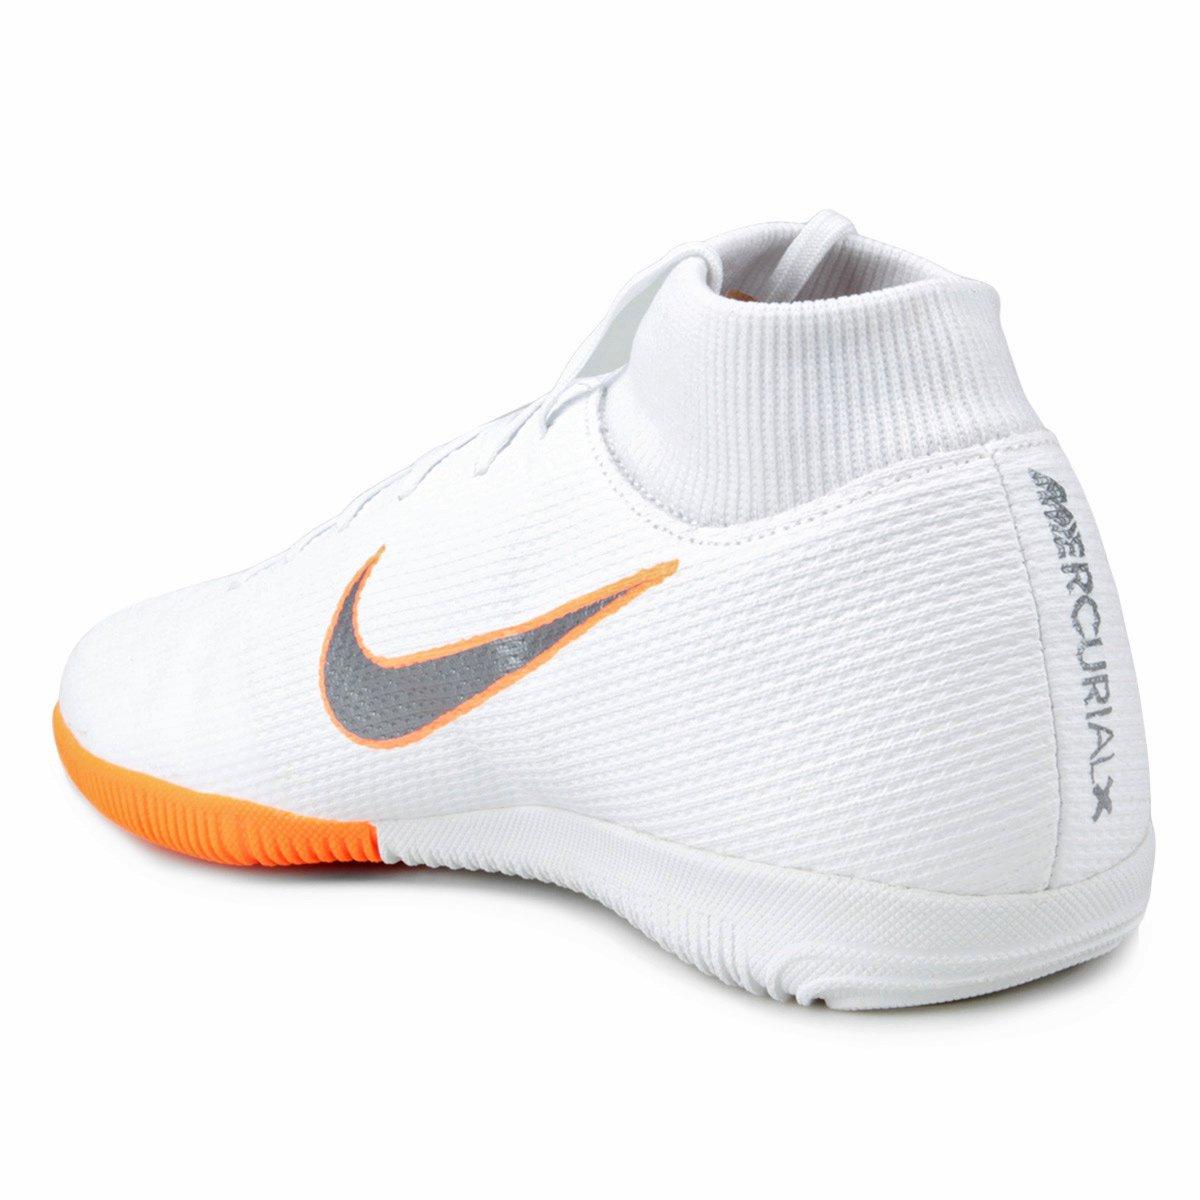 250b6adcb70 Chuteira Futsal Nike Mercurial Superfly 6 Academy